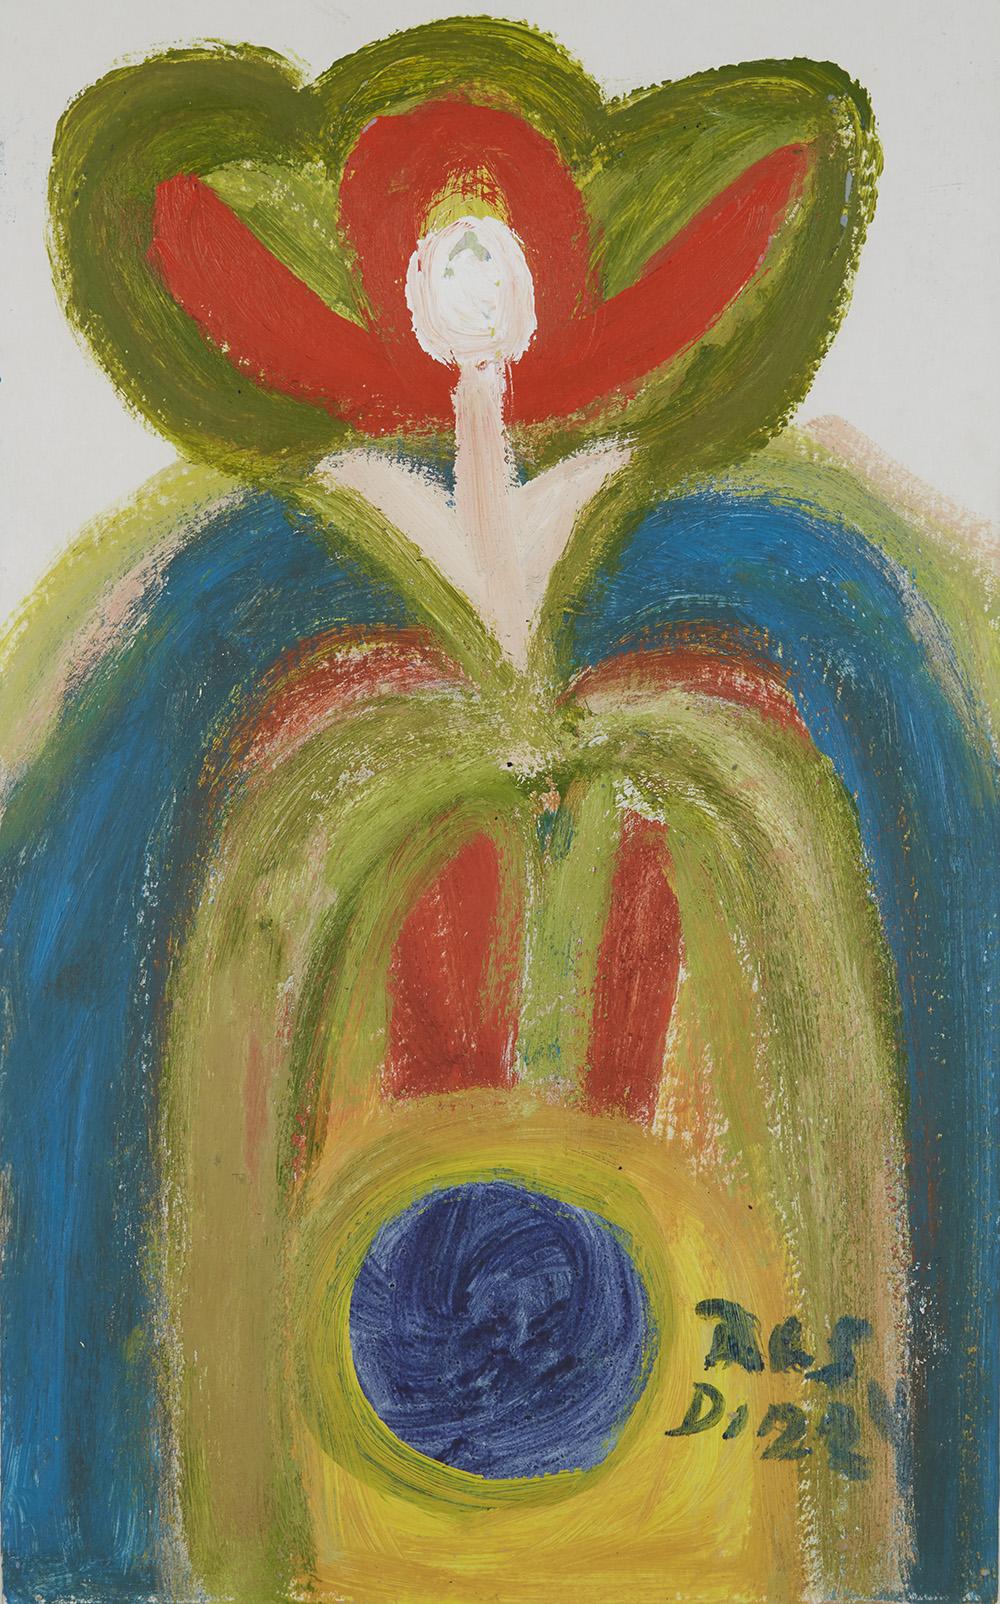 Ras Dizzy Rose Choice, 1997 Tempera on matboard 16.75 x 10.5 inches 42.5 x 26.7 cm RD 46